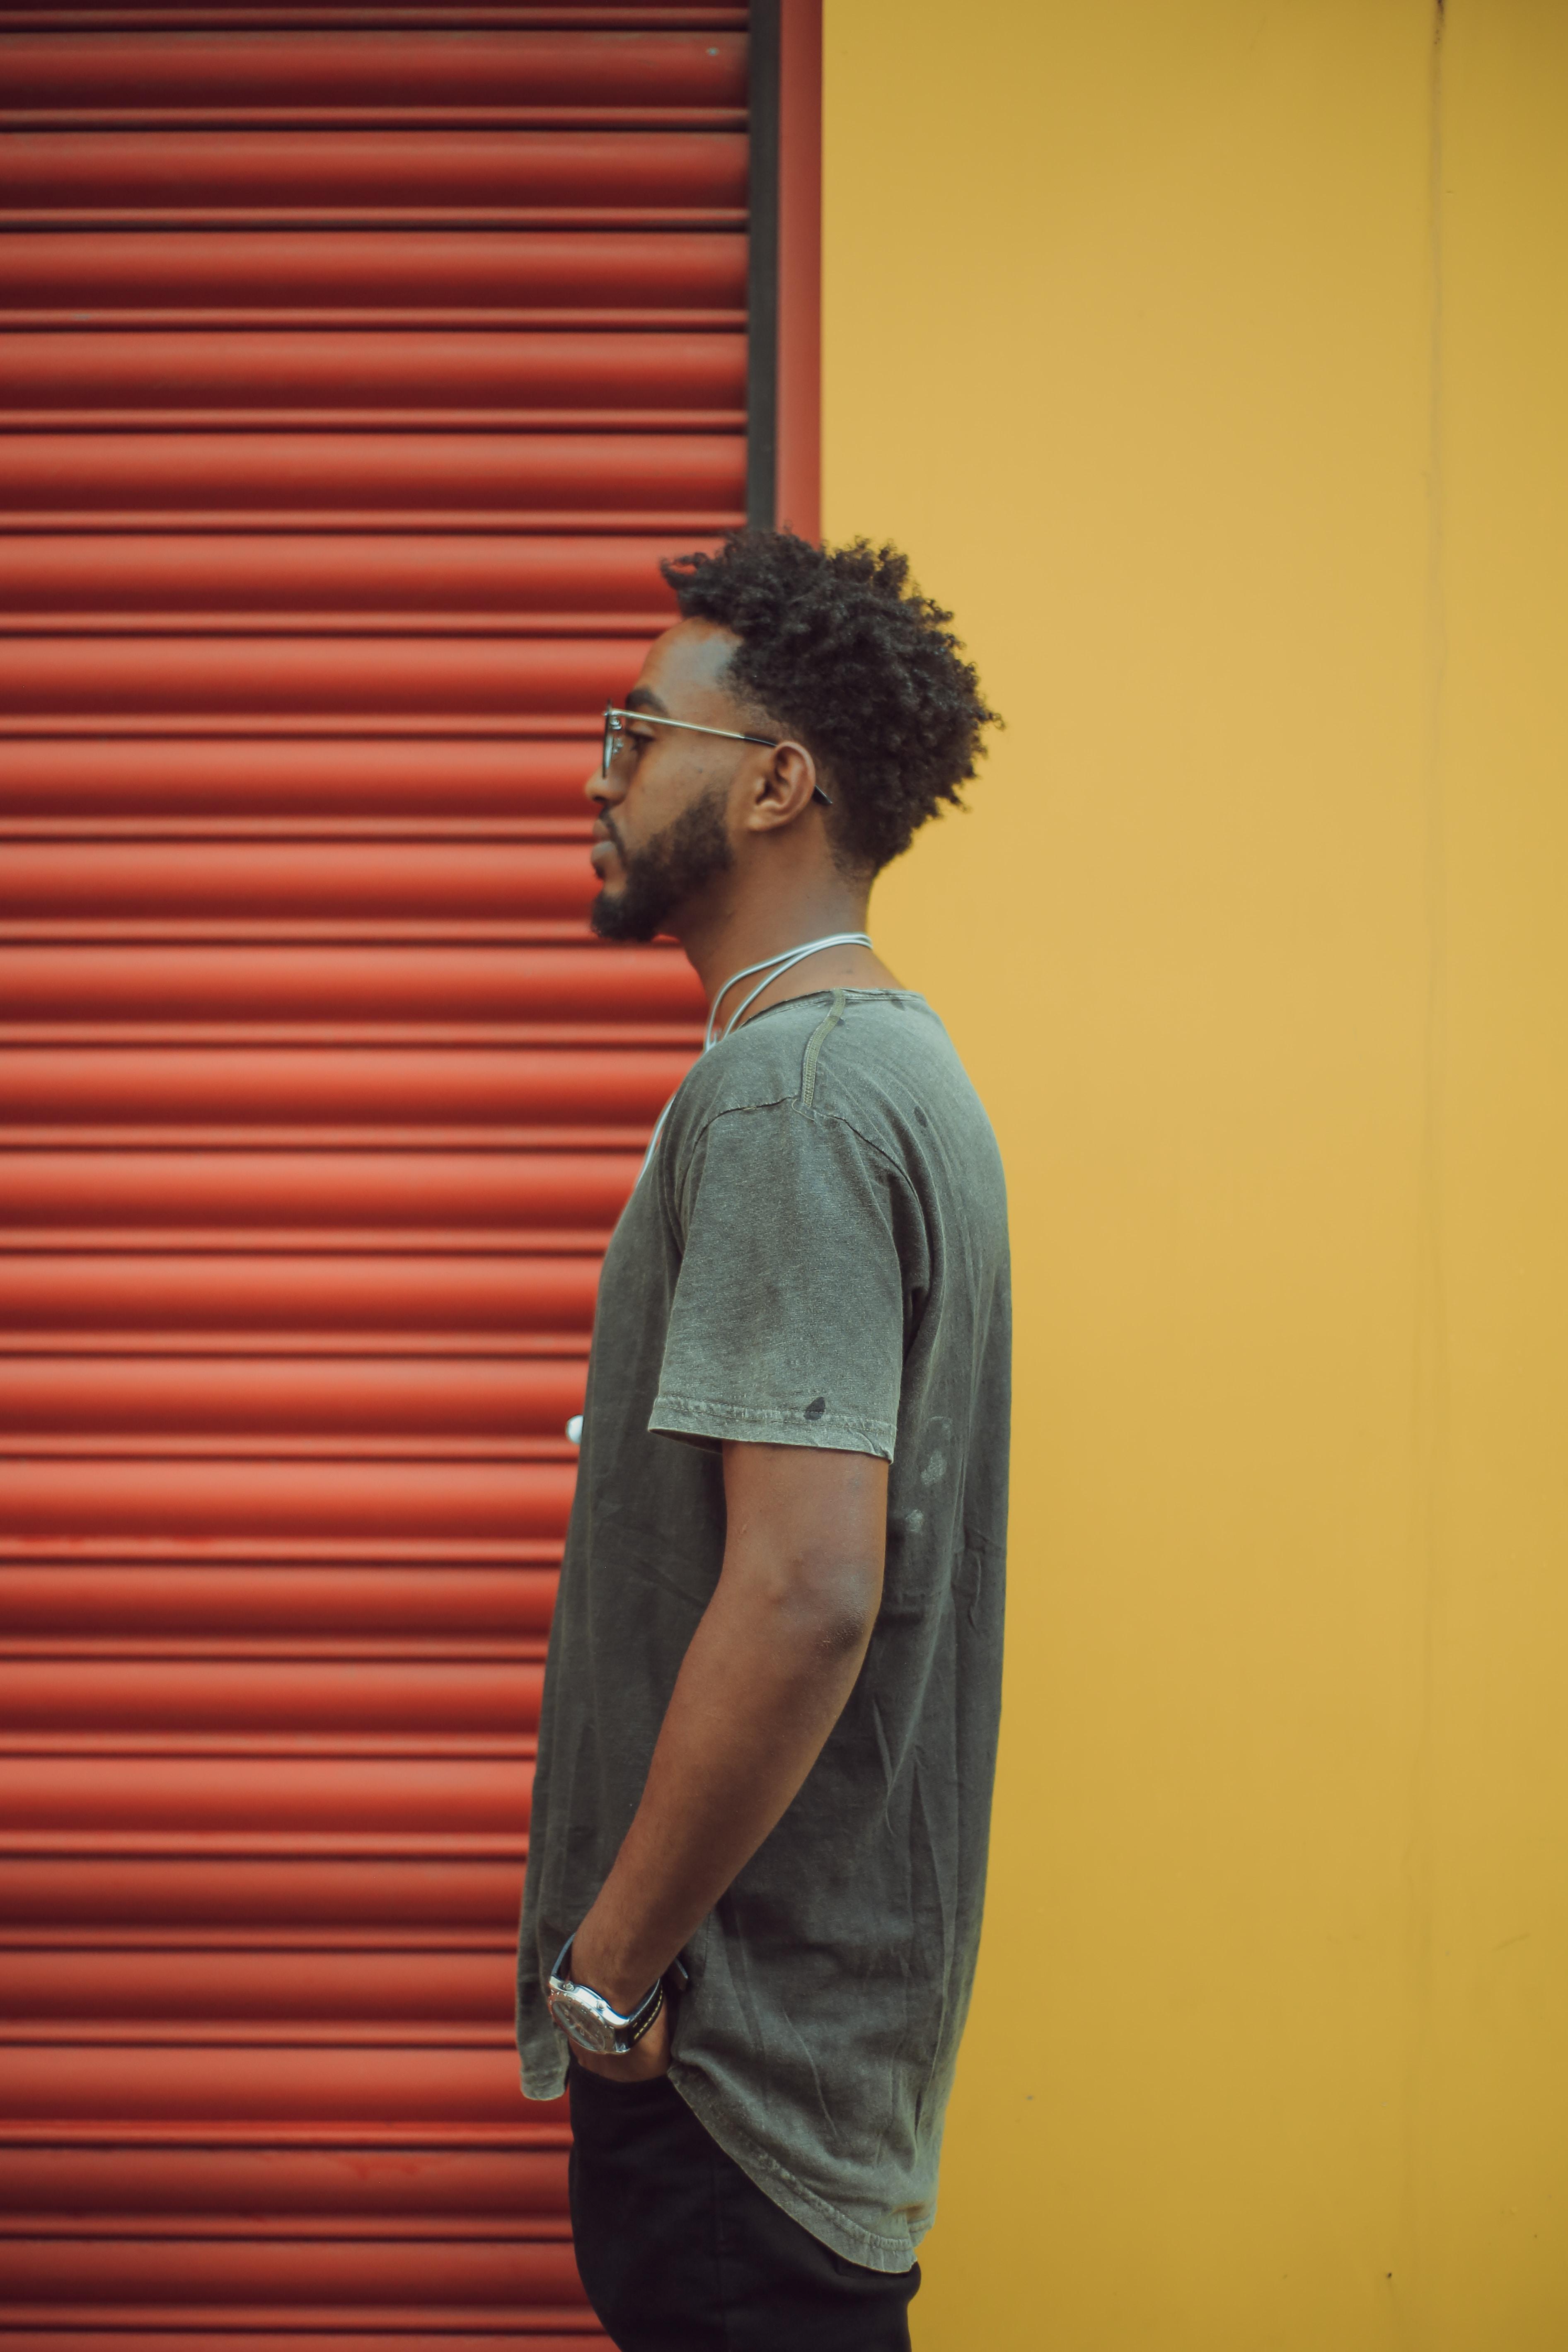 man in gray t-shirt standing near red roll up door